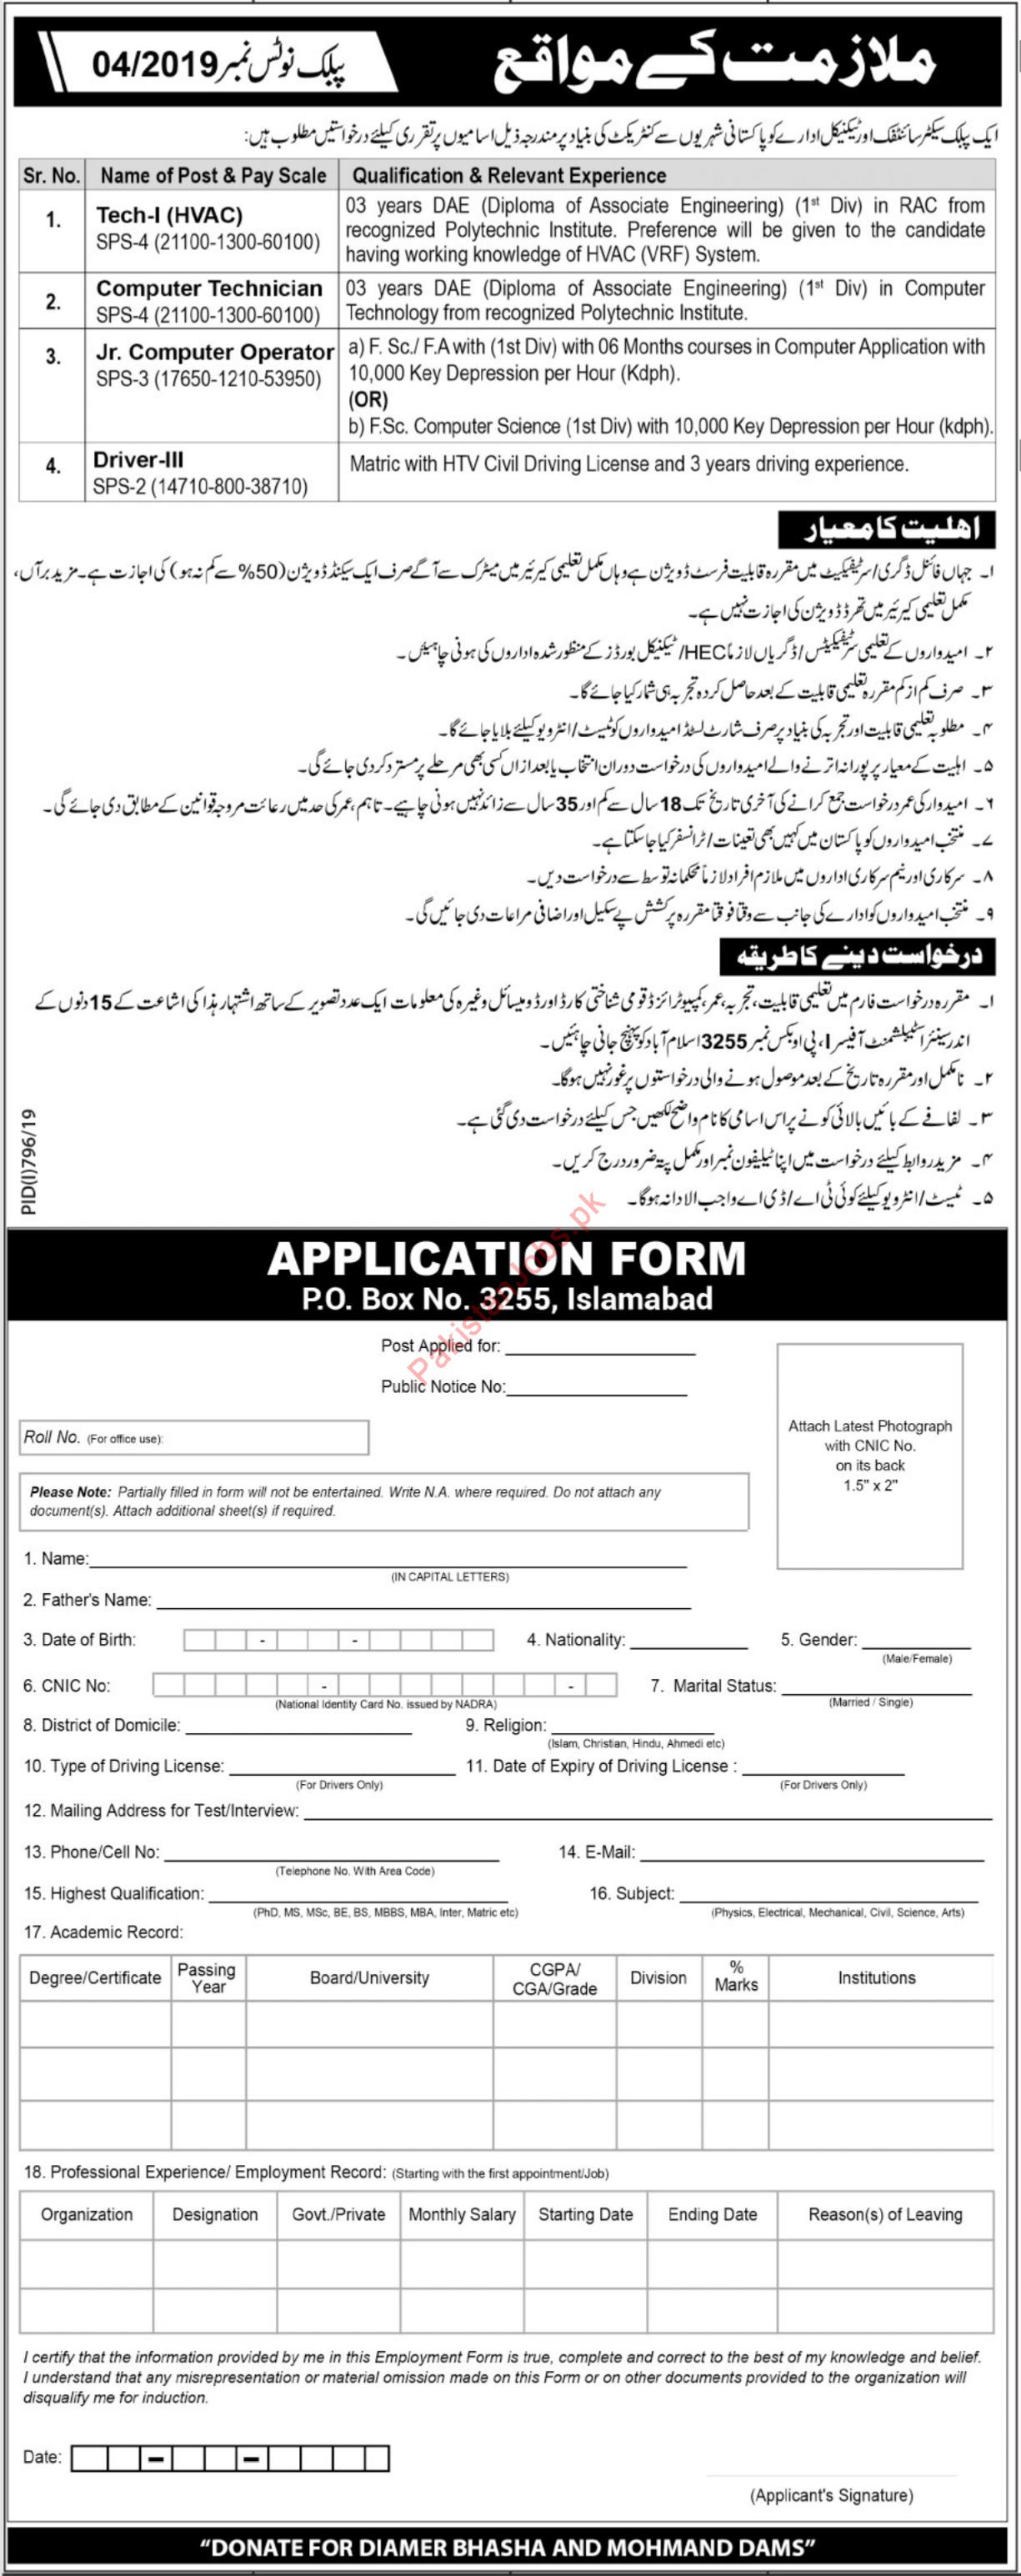 Pakistan Atomic Energy Commission PAEC Jobs in Islamabad 2019 2019